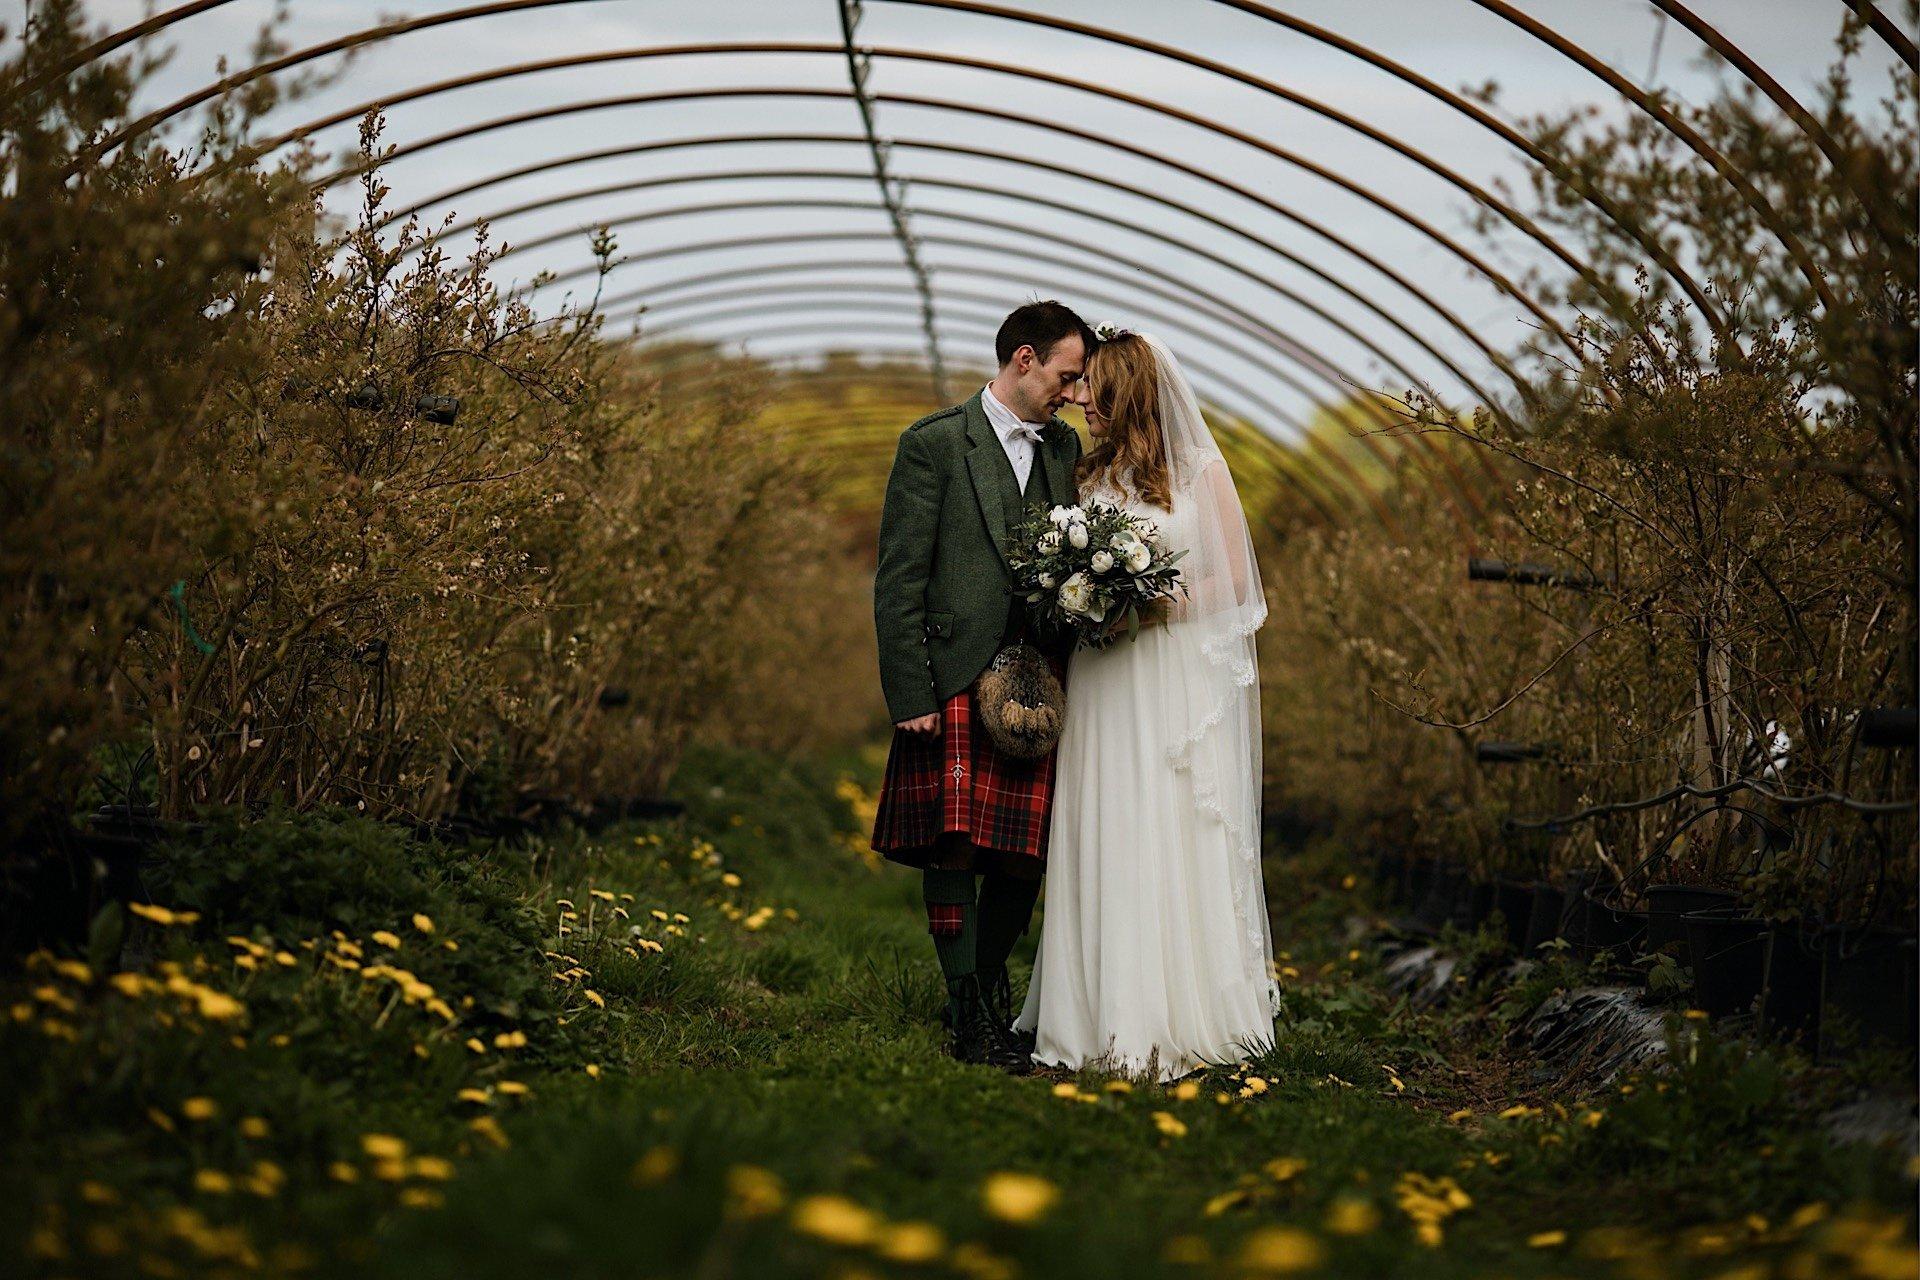 polytunnel bride frame groom posing and under